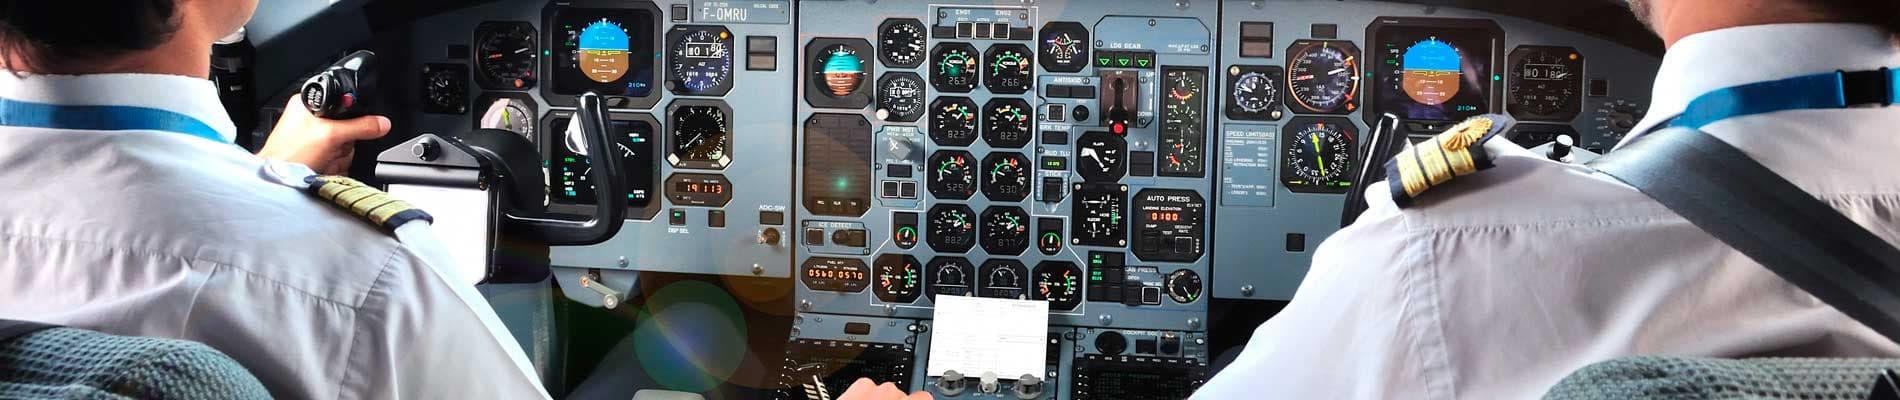 Autista e pilota